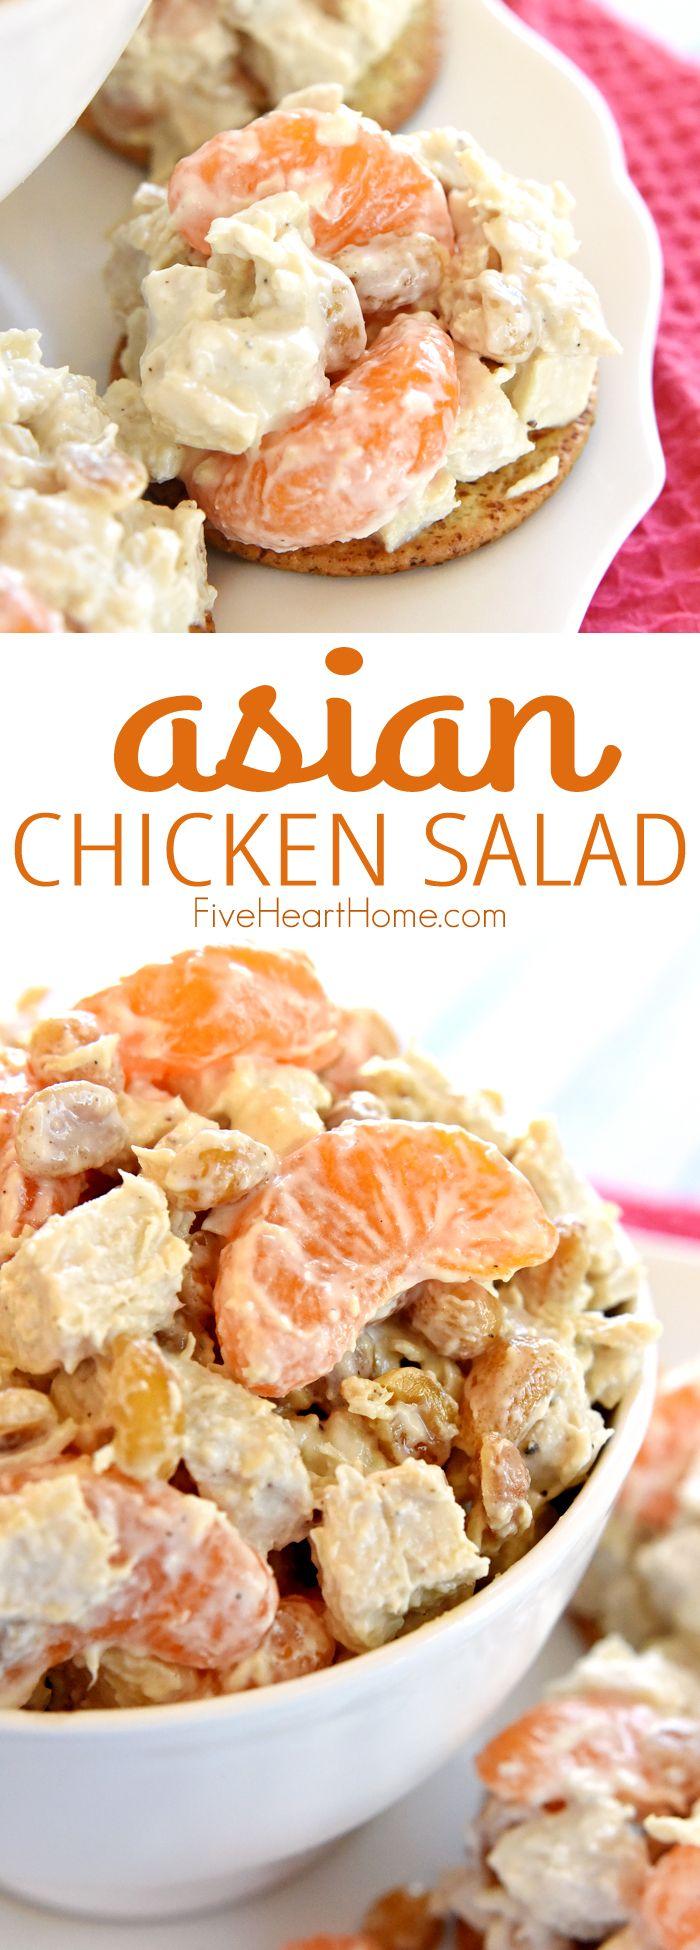 Asian Chicken Salad FoodBlogs.com